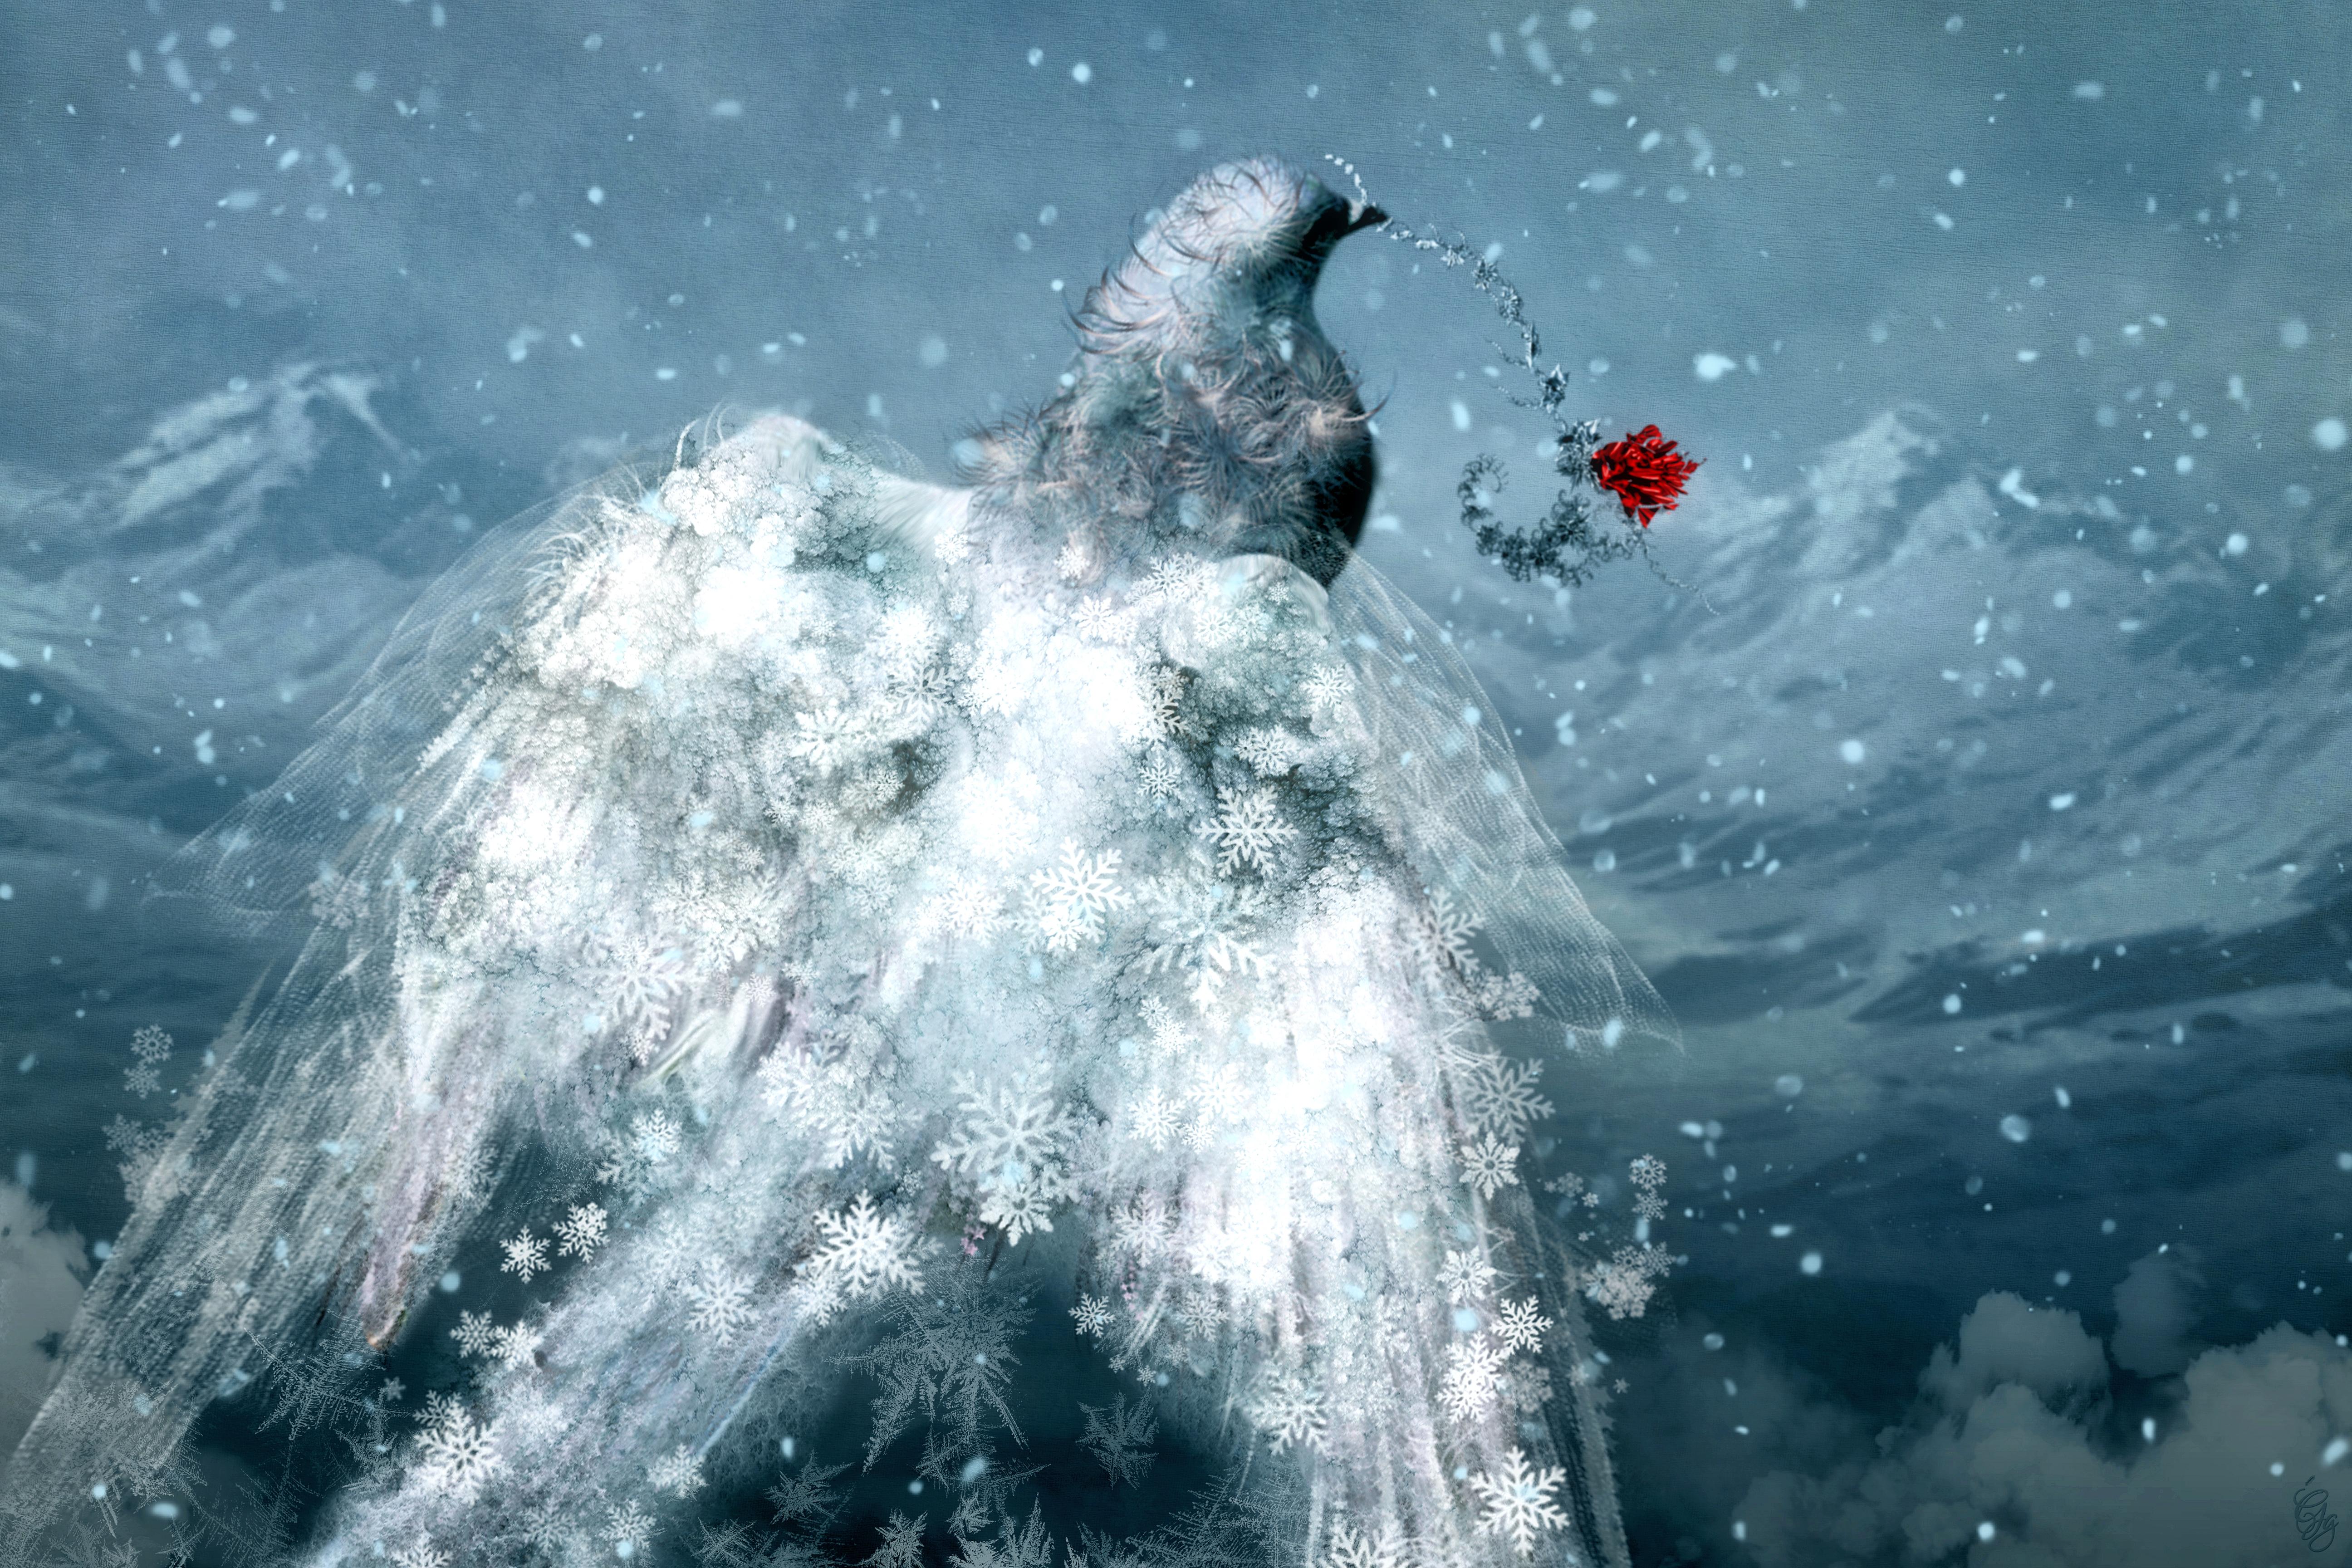 Die gefiederte Braut